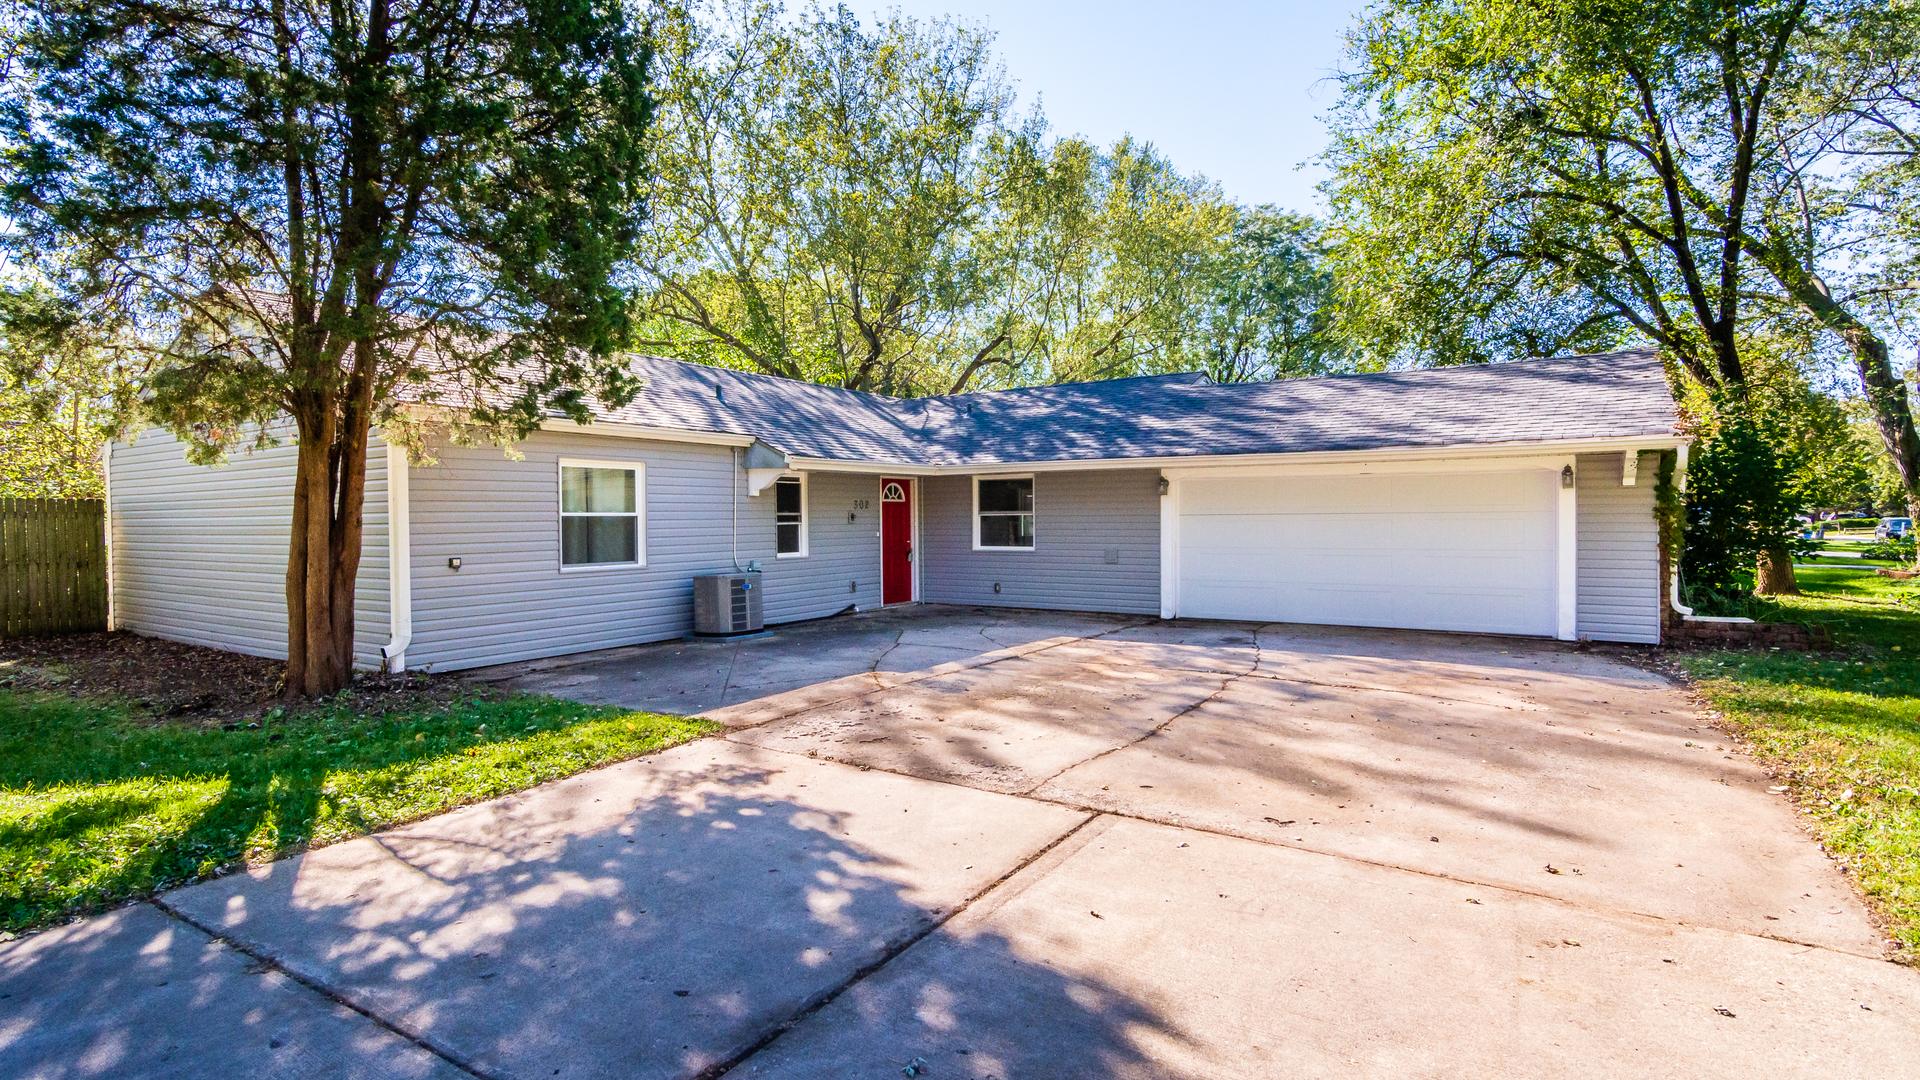 302 Seabury ,Bolingbrook, Illinois 60440